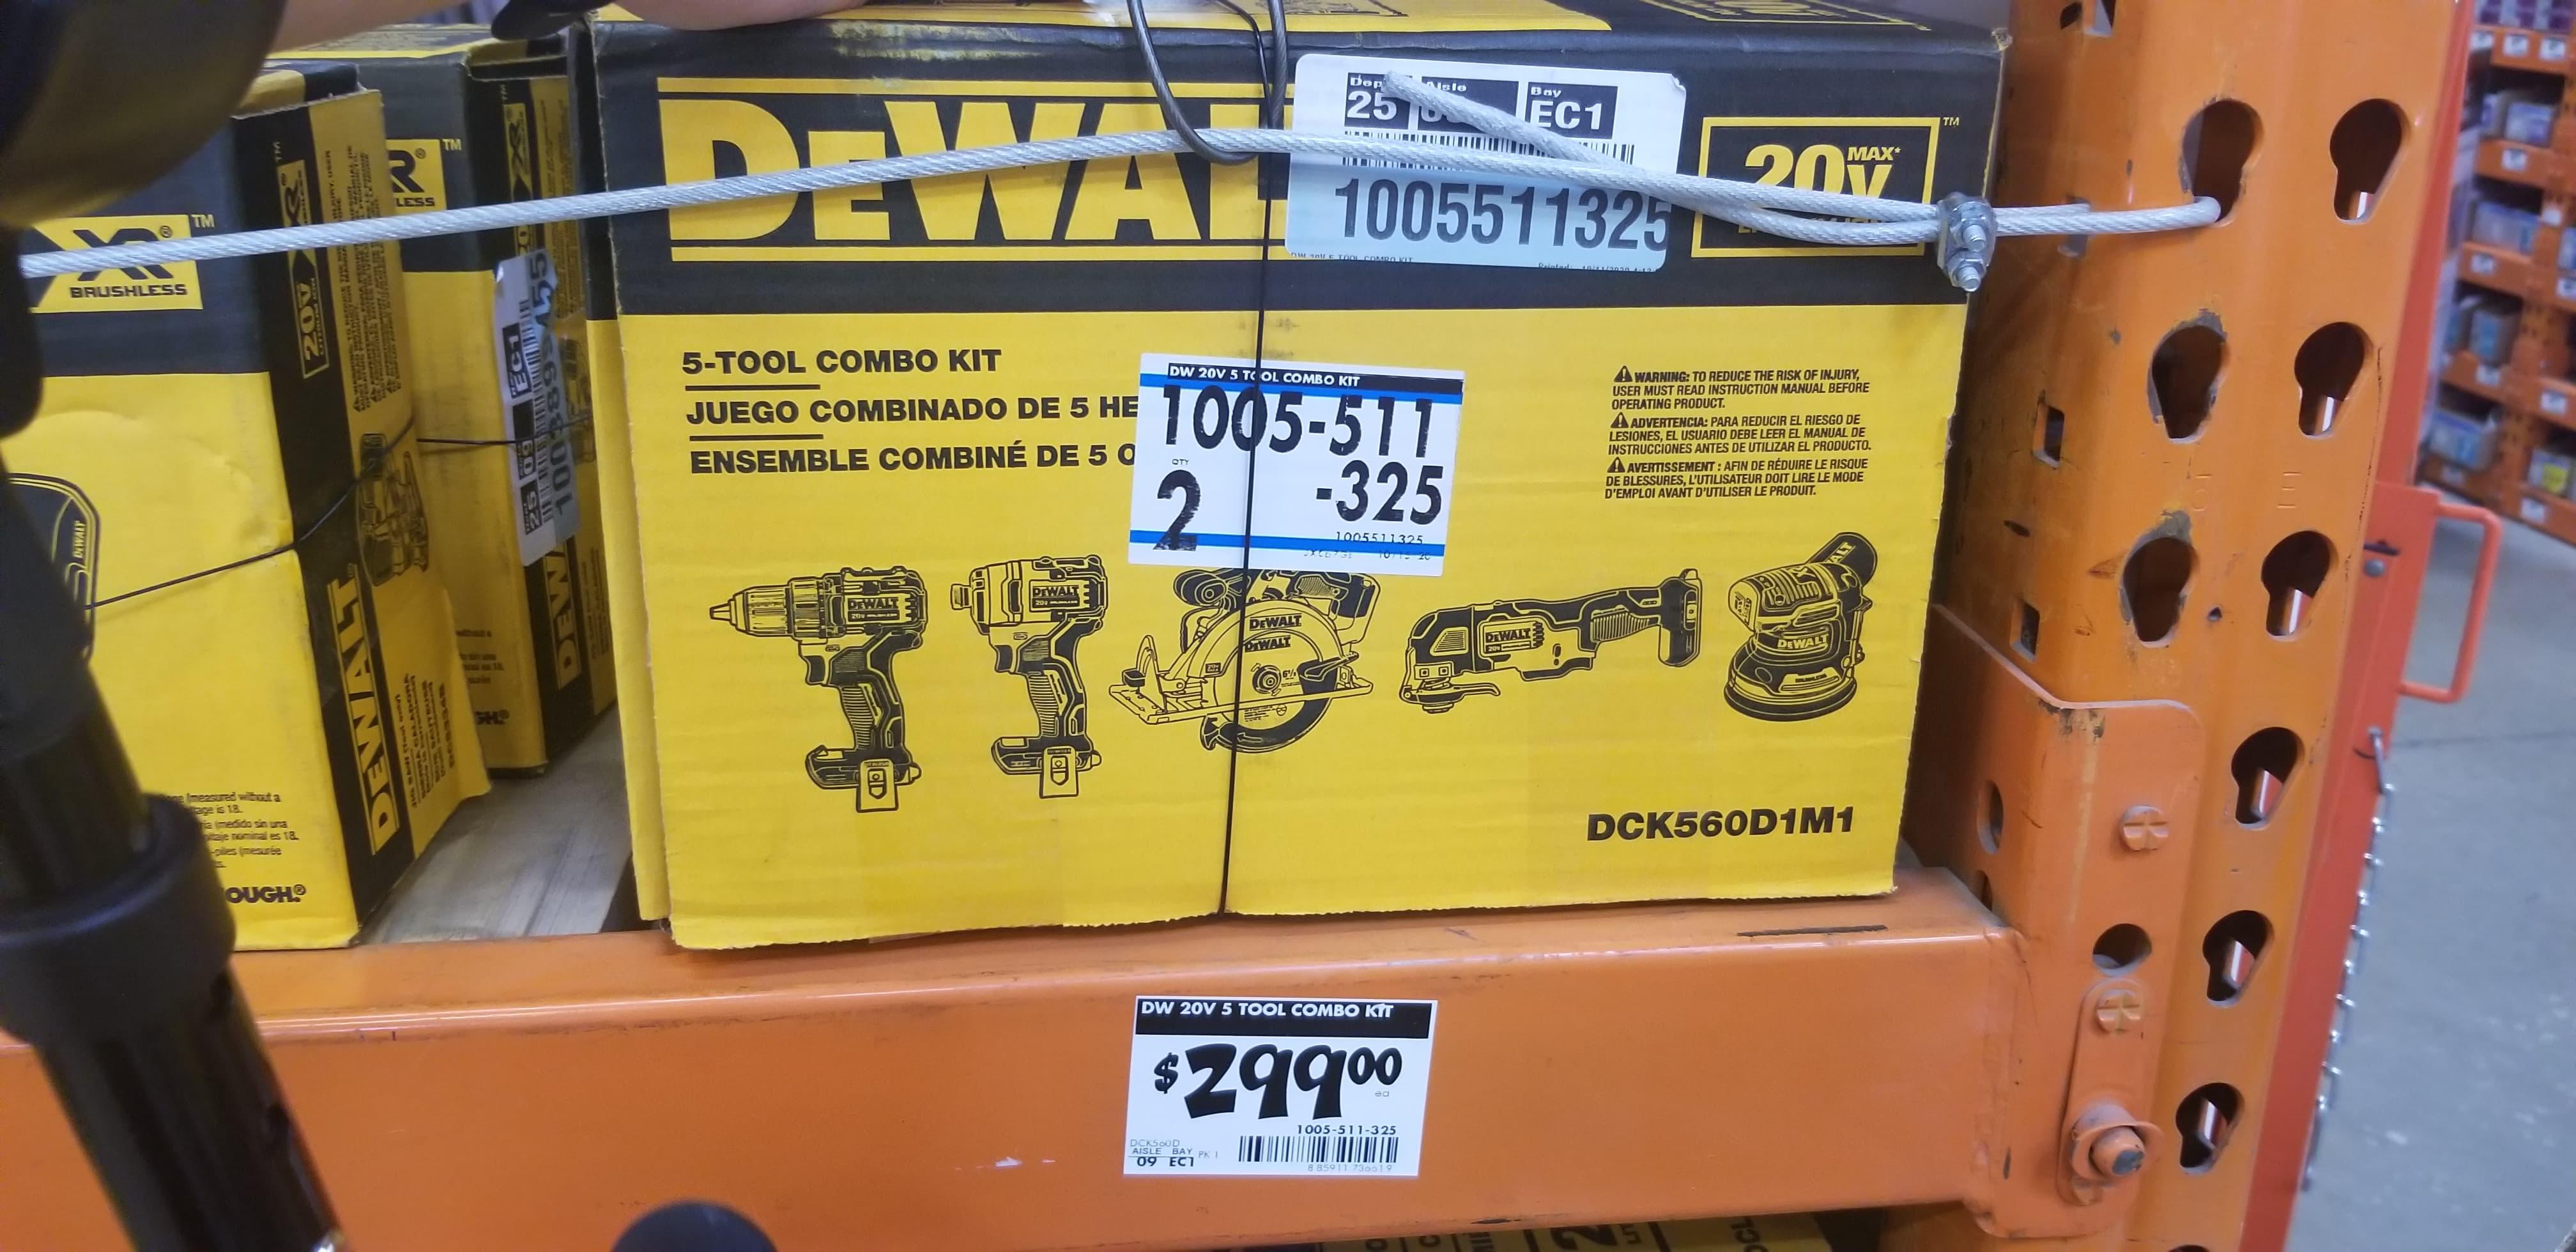 $299, DeWalt 5 Tool Kit DCK560D1M1